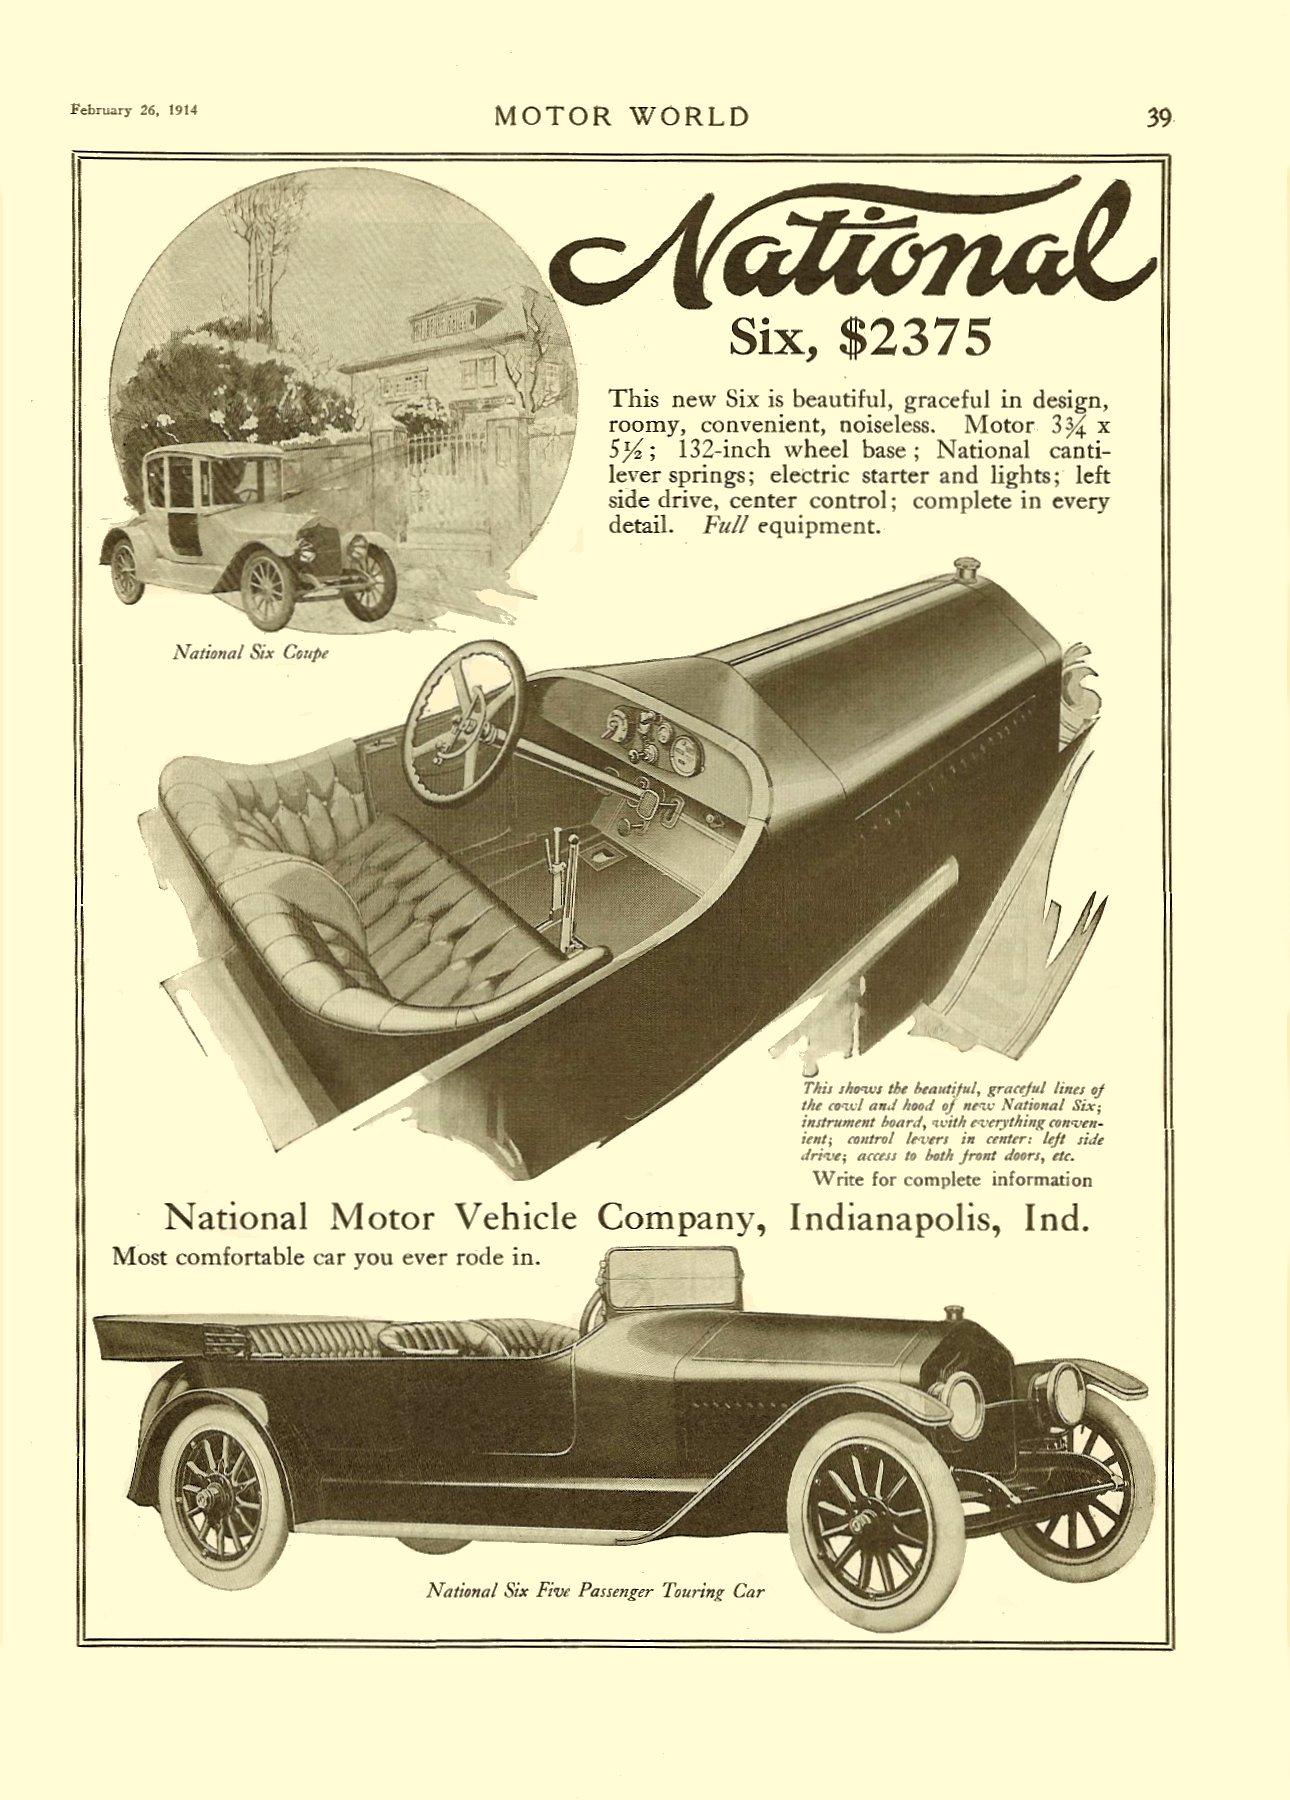 1914 2 26 NATIONAL National Six $2,375 MOTOR WORLD February 26, 1914 9″x12″ page 39